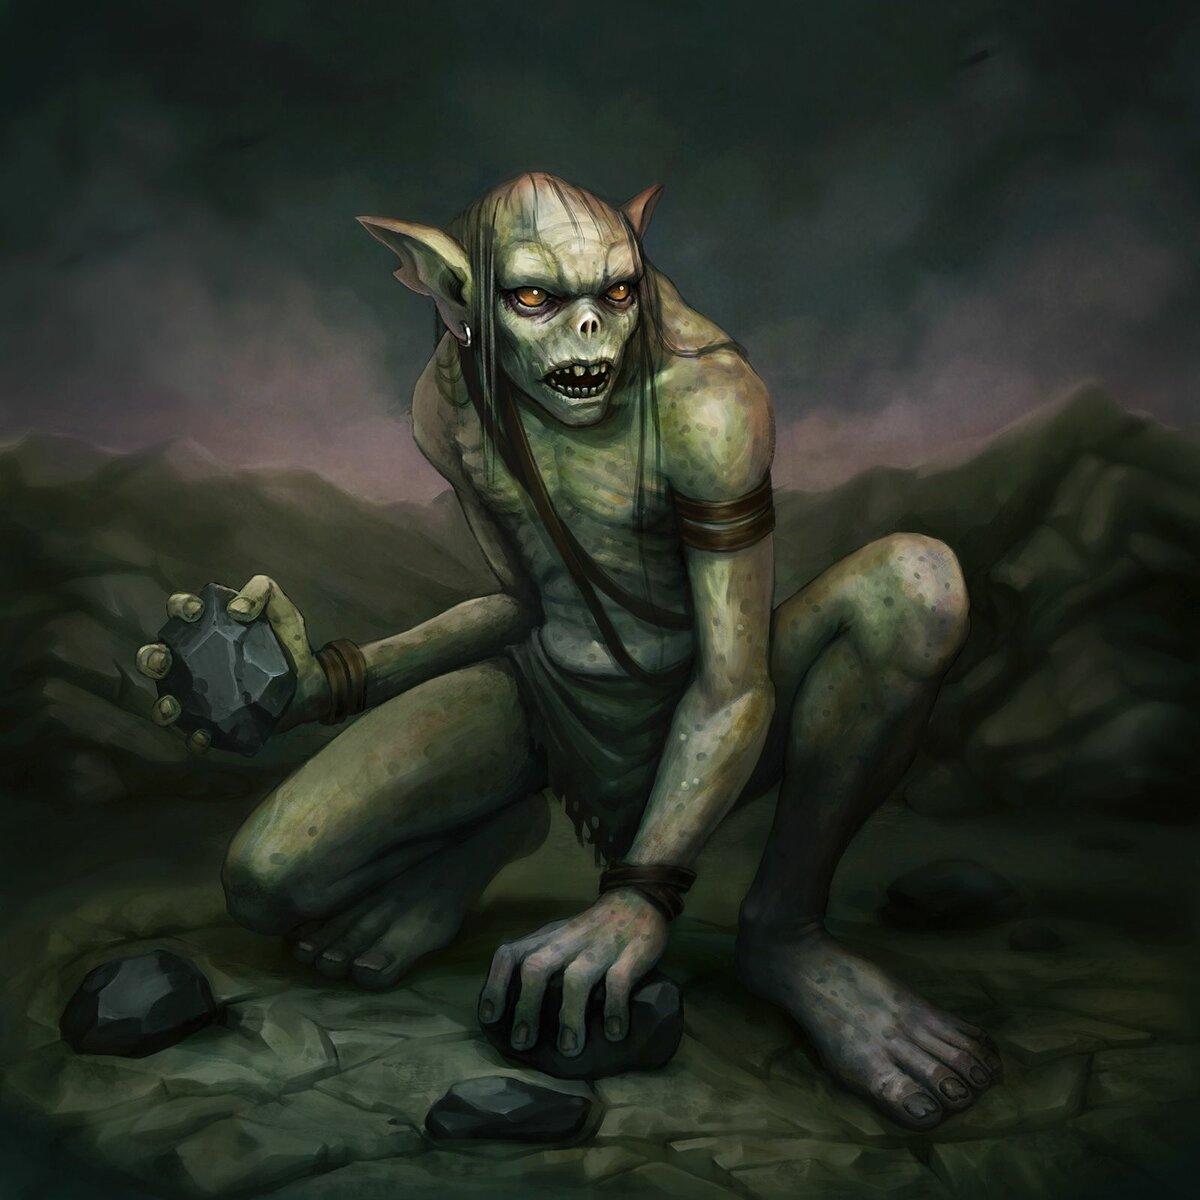 Убийца гоблинов | goblin slayer / убийца гоблинов вики | fandom